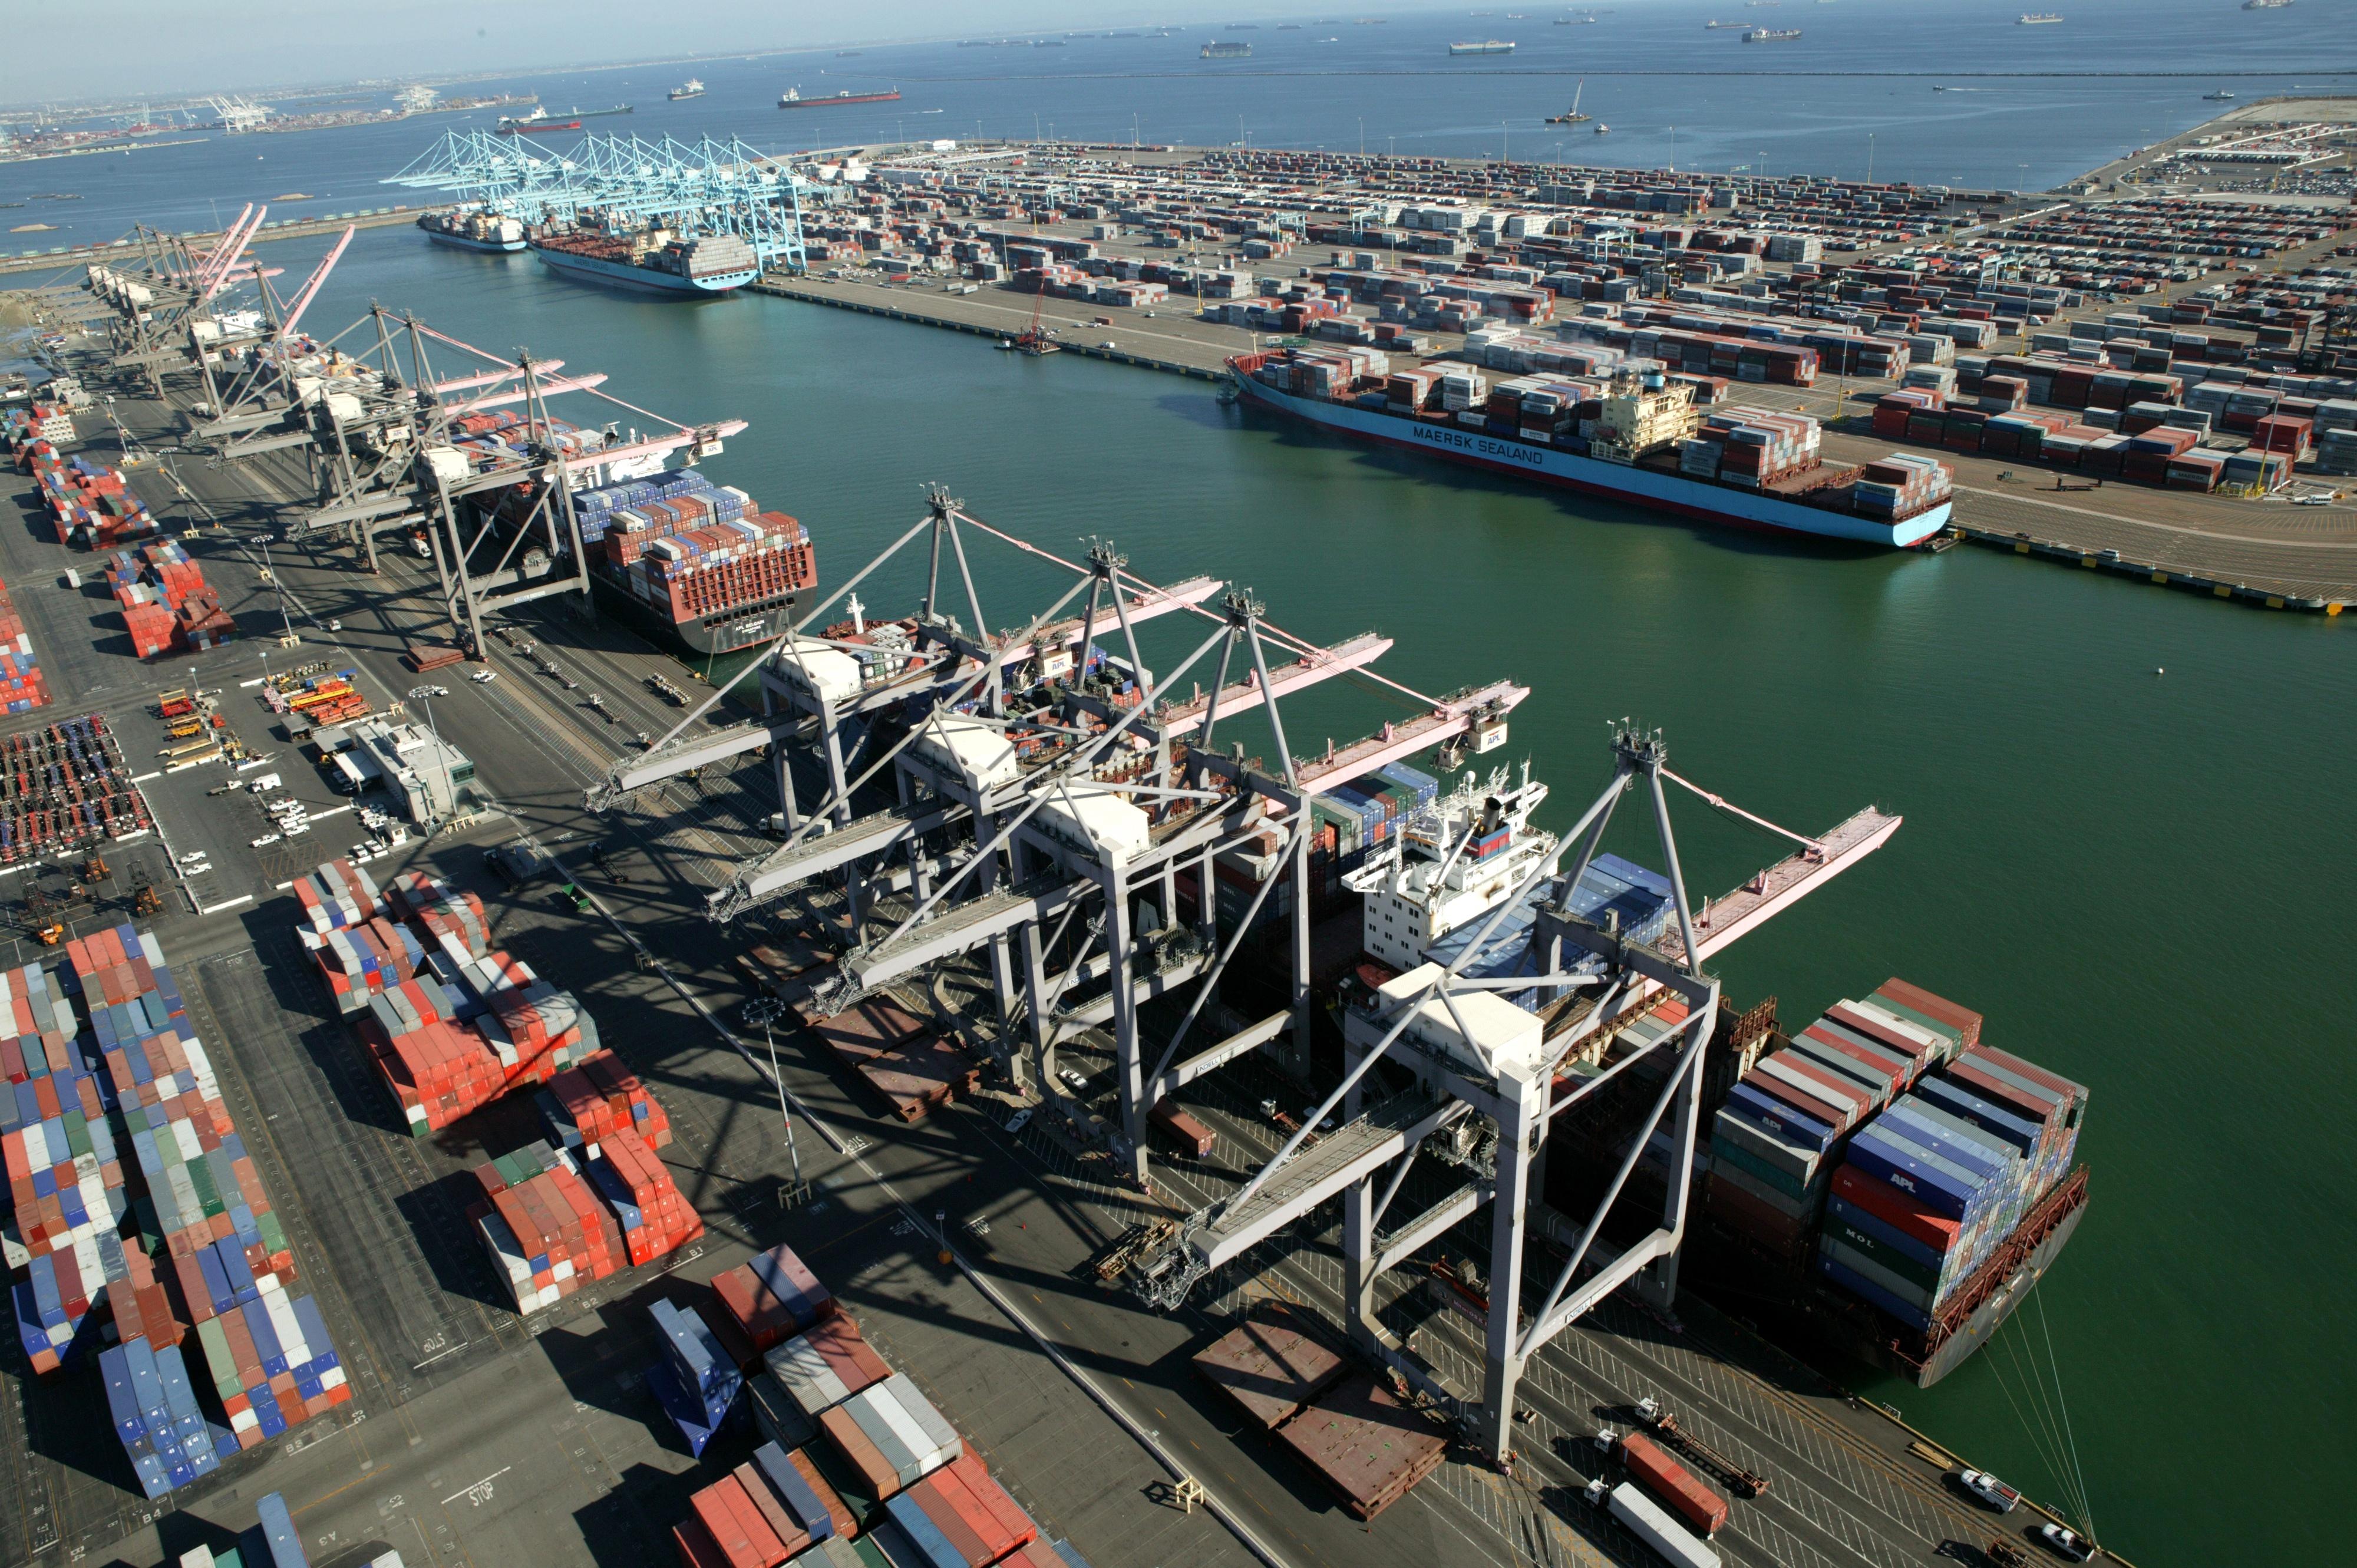 Port_of_LA_Pier 300_400 Container Terminals-1